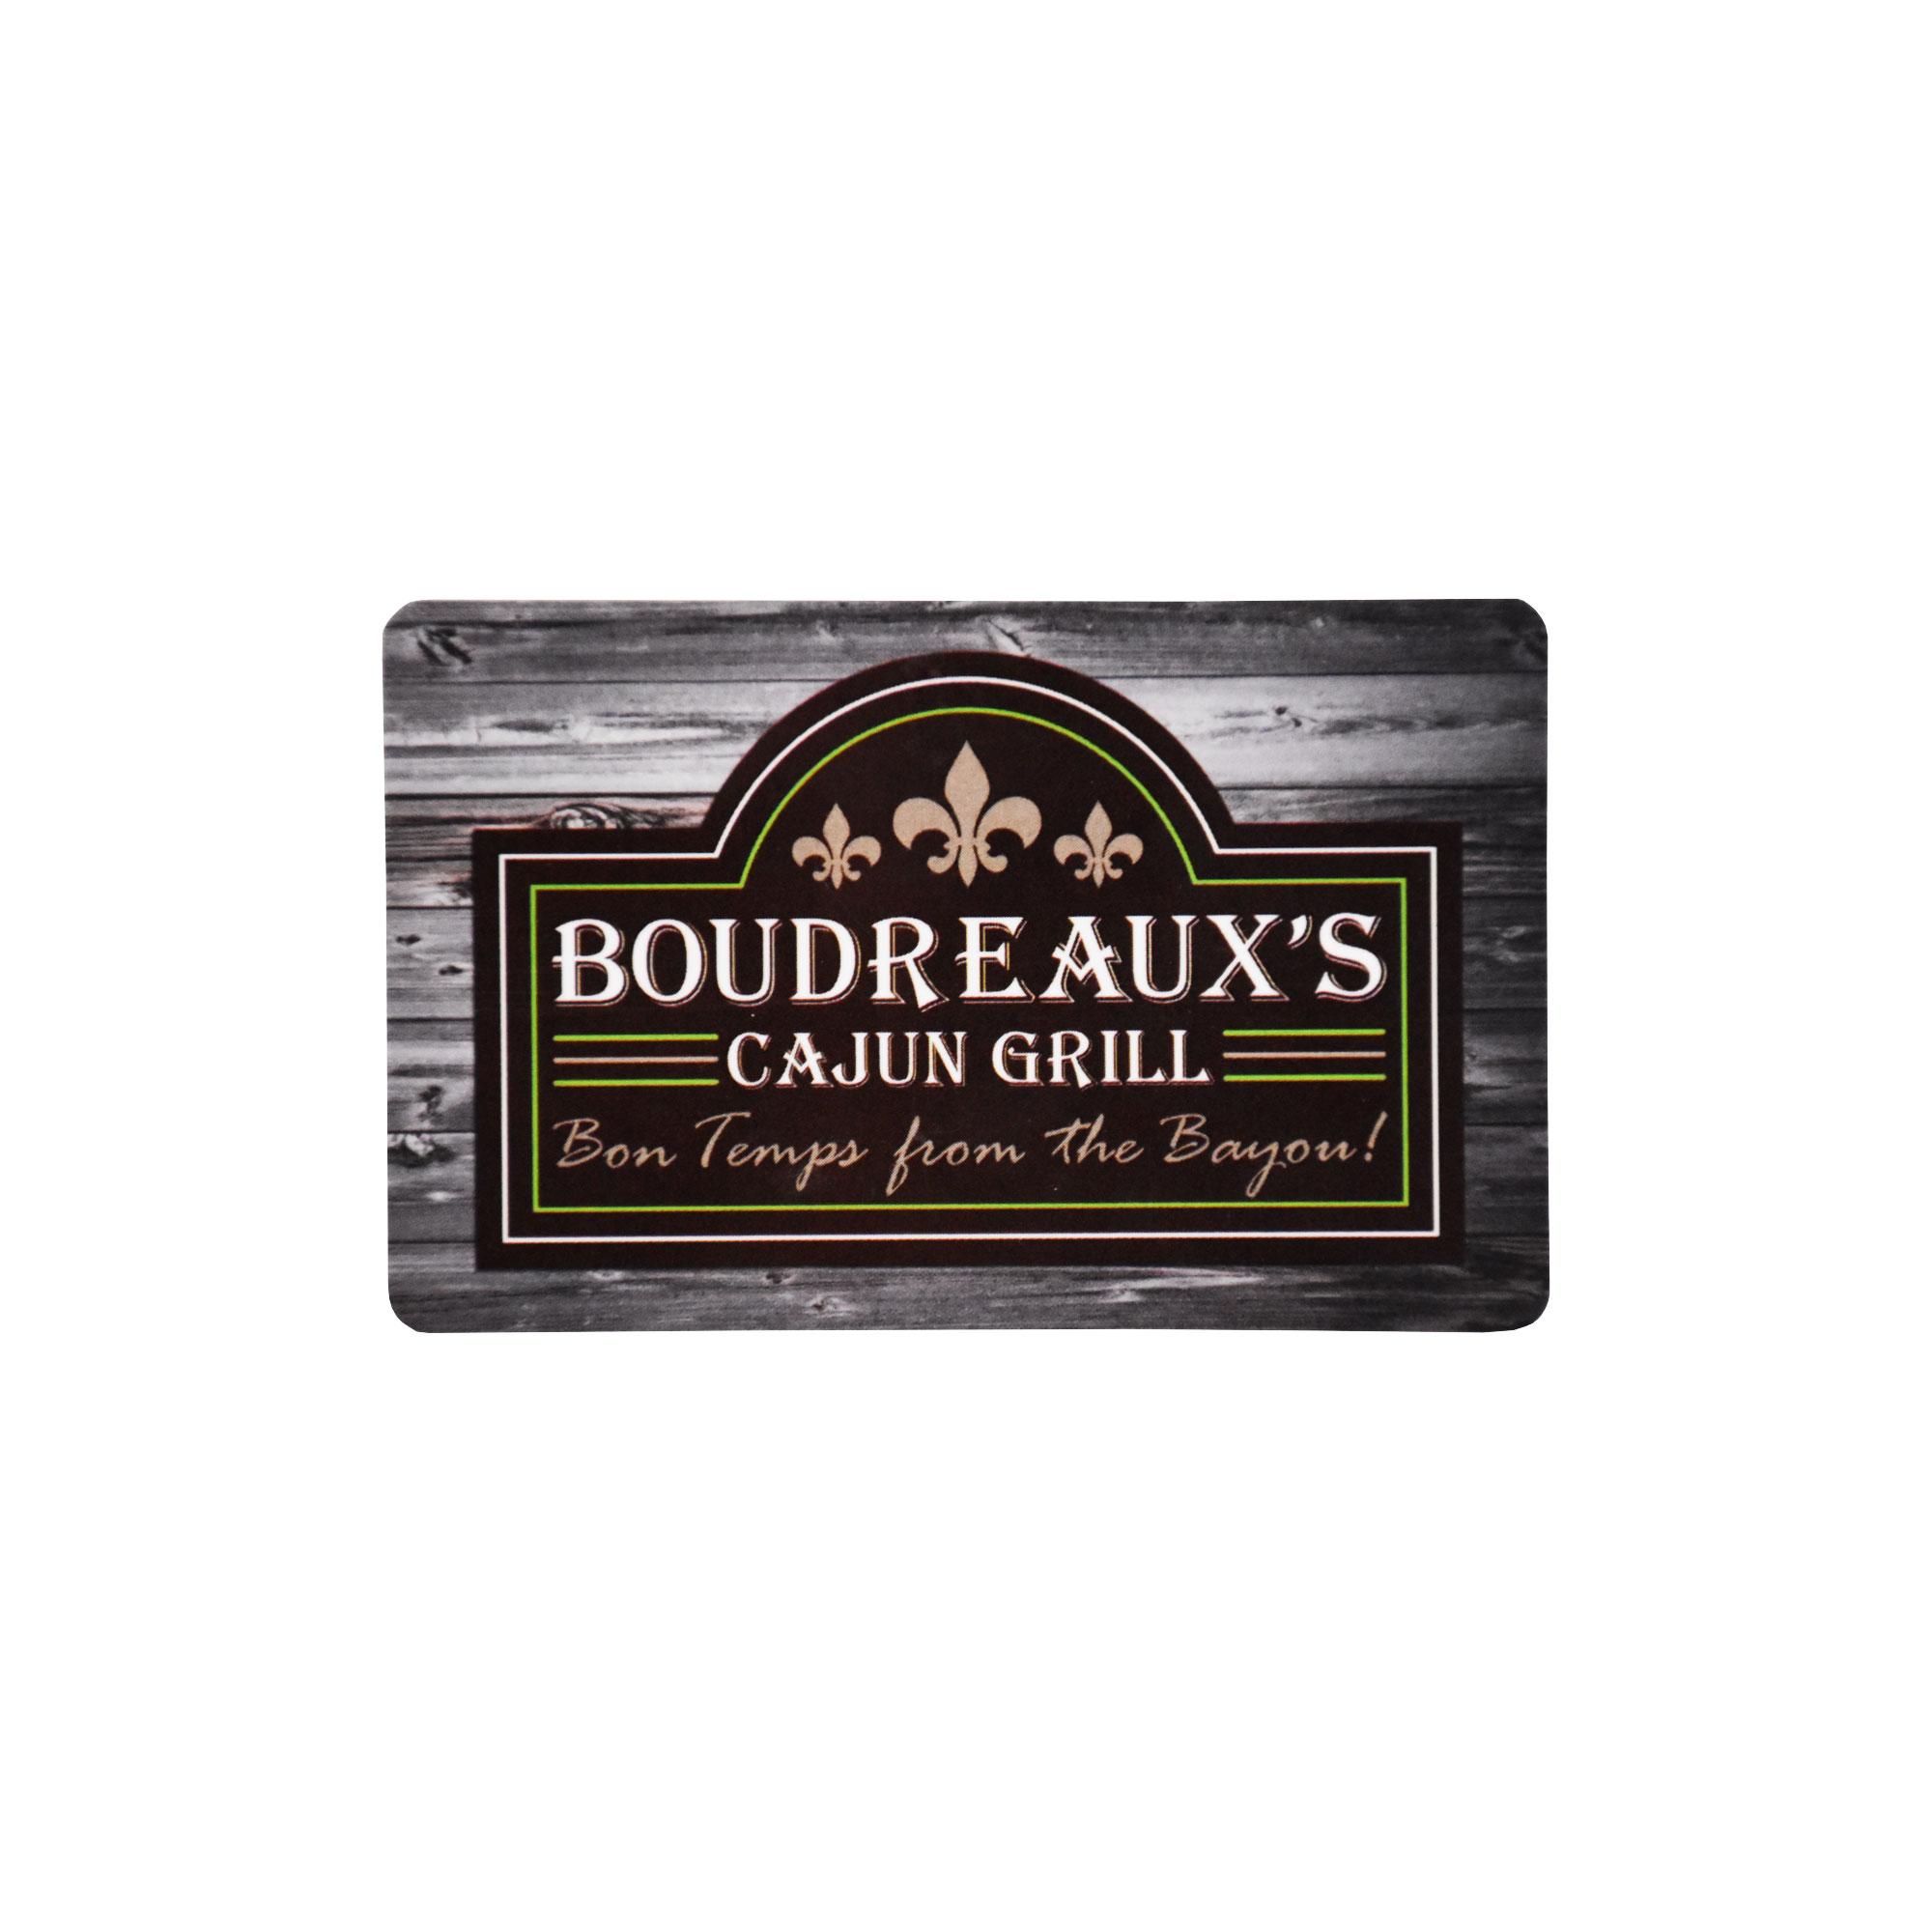 Boudreaux's Cajun Grill - Gift Card